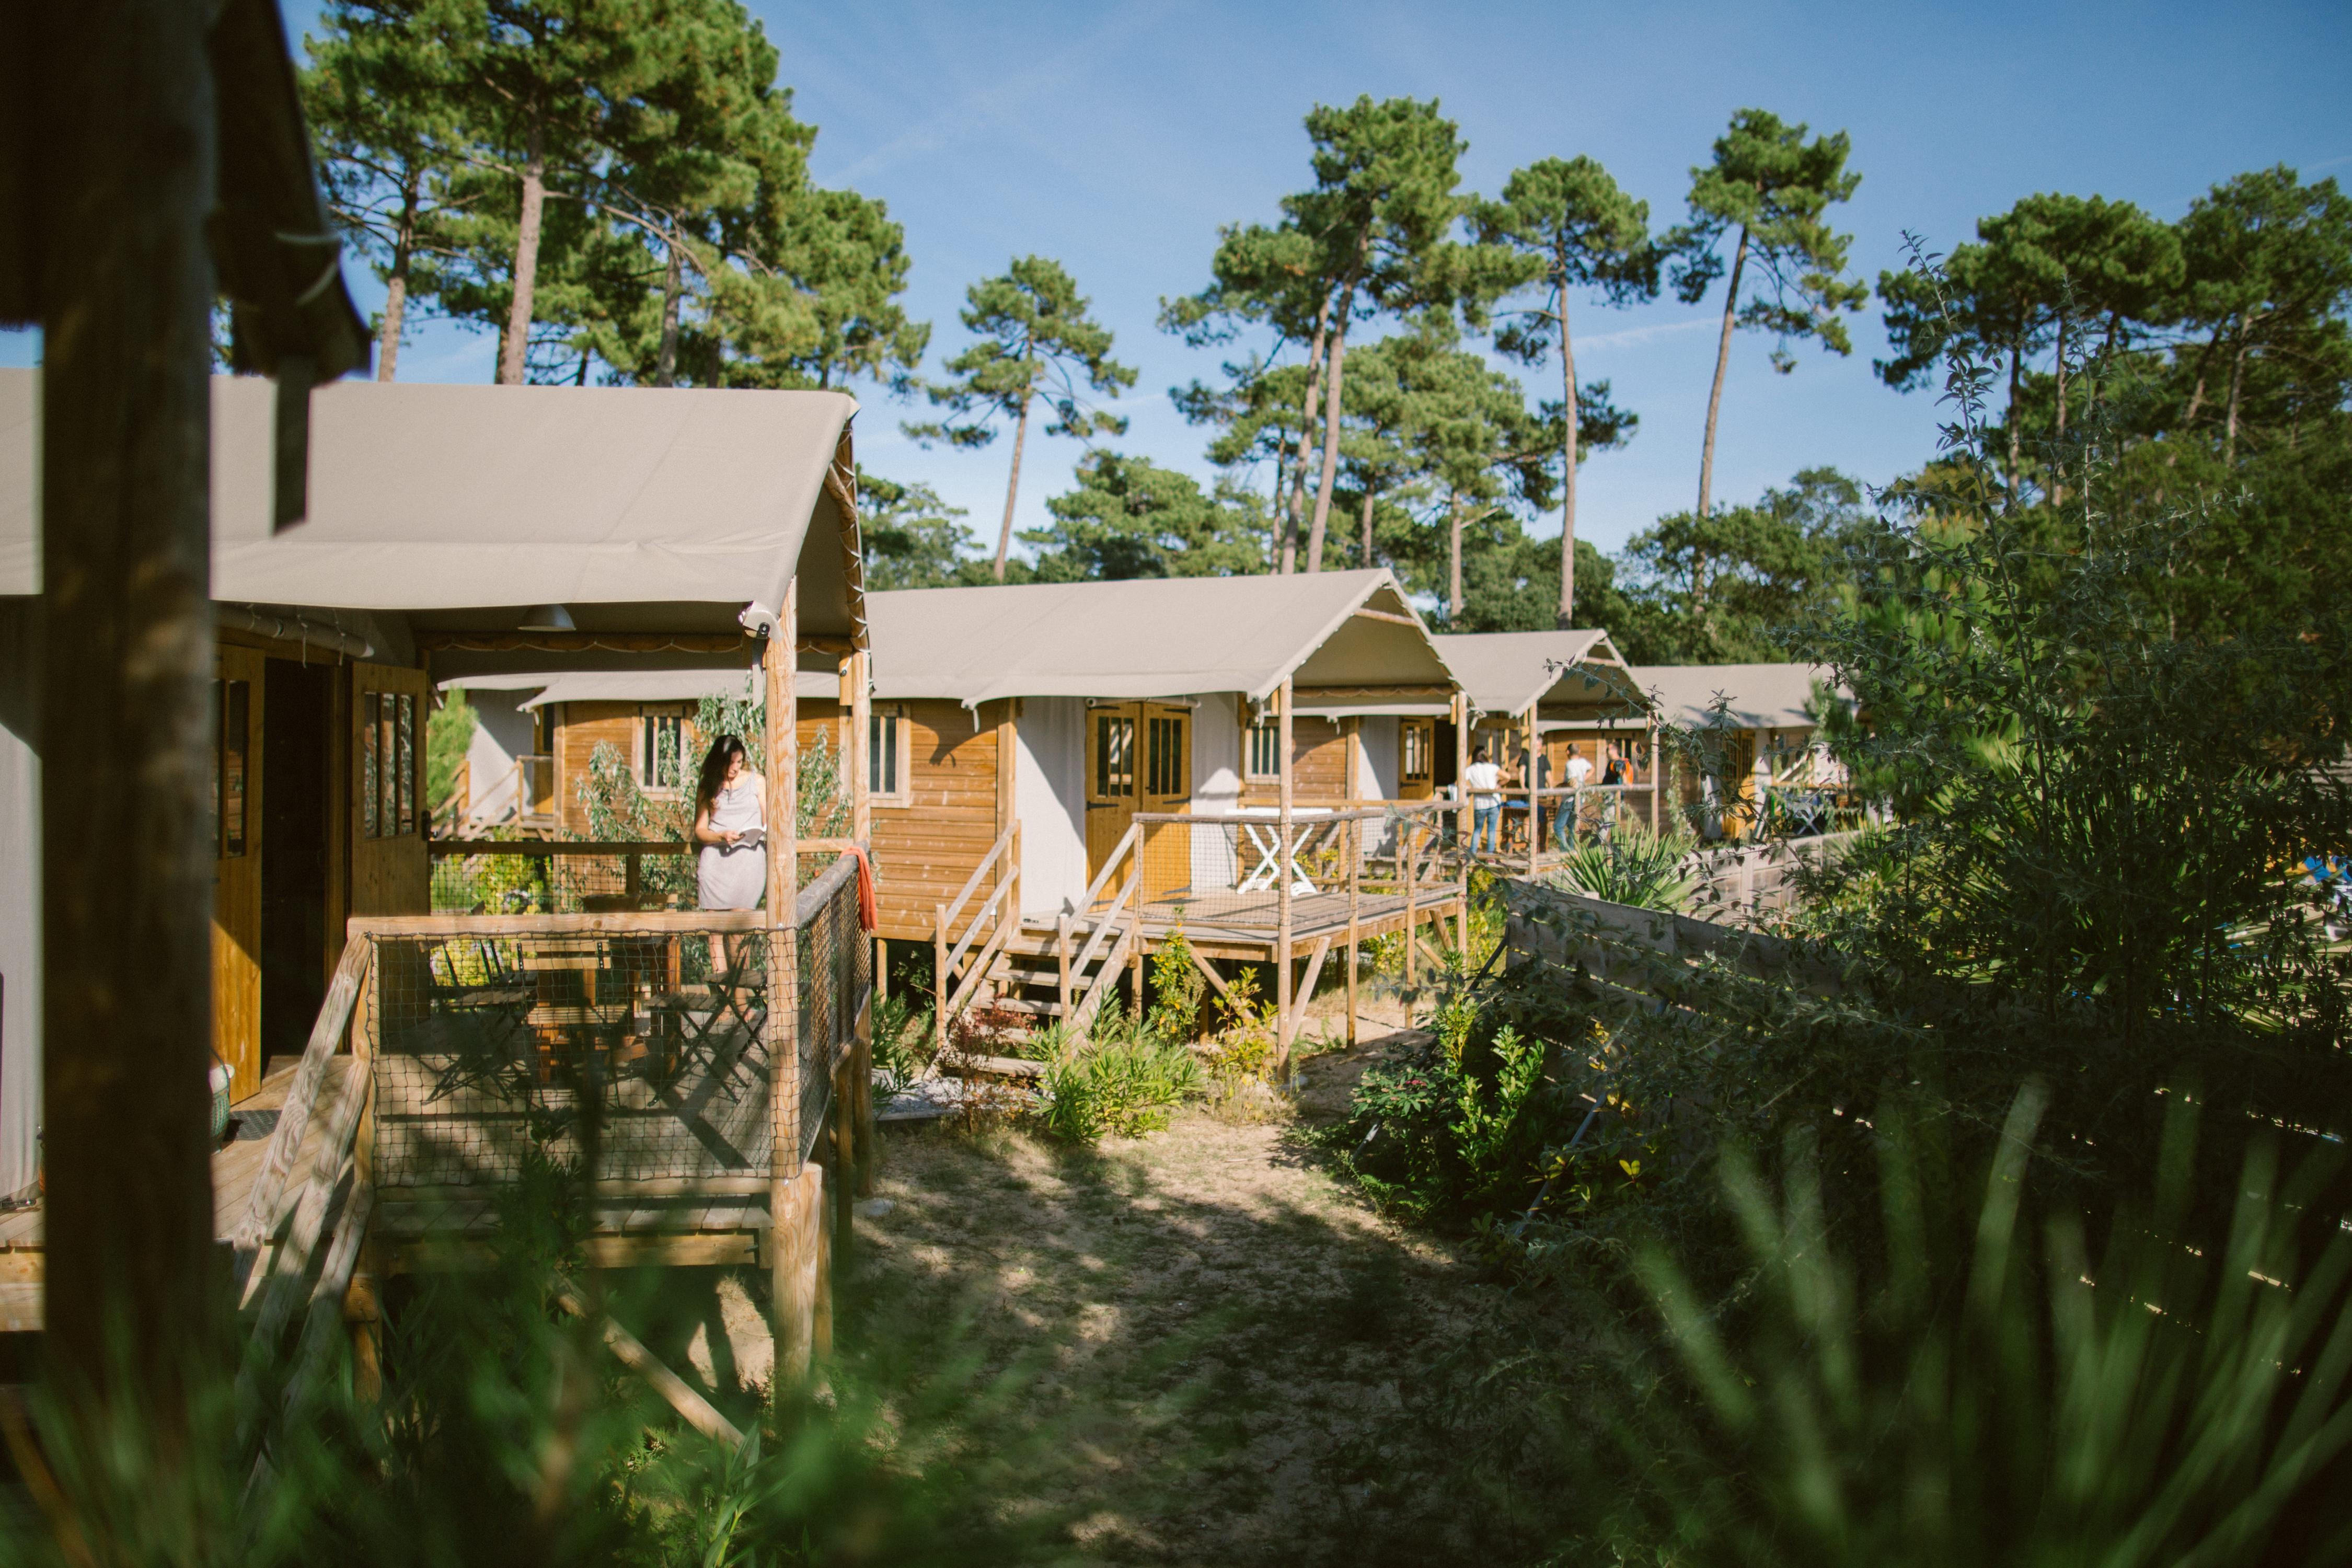 Camping Village Naturéo, Seignosse, Landes